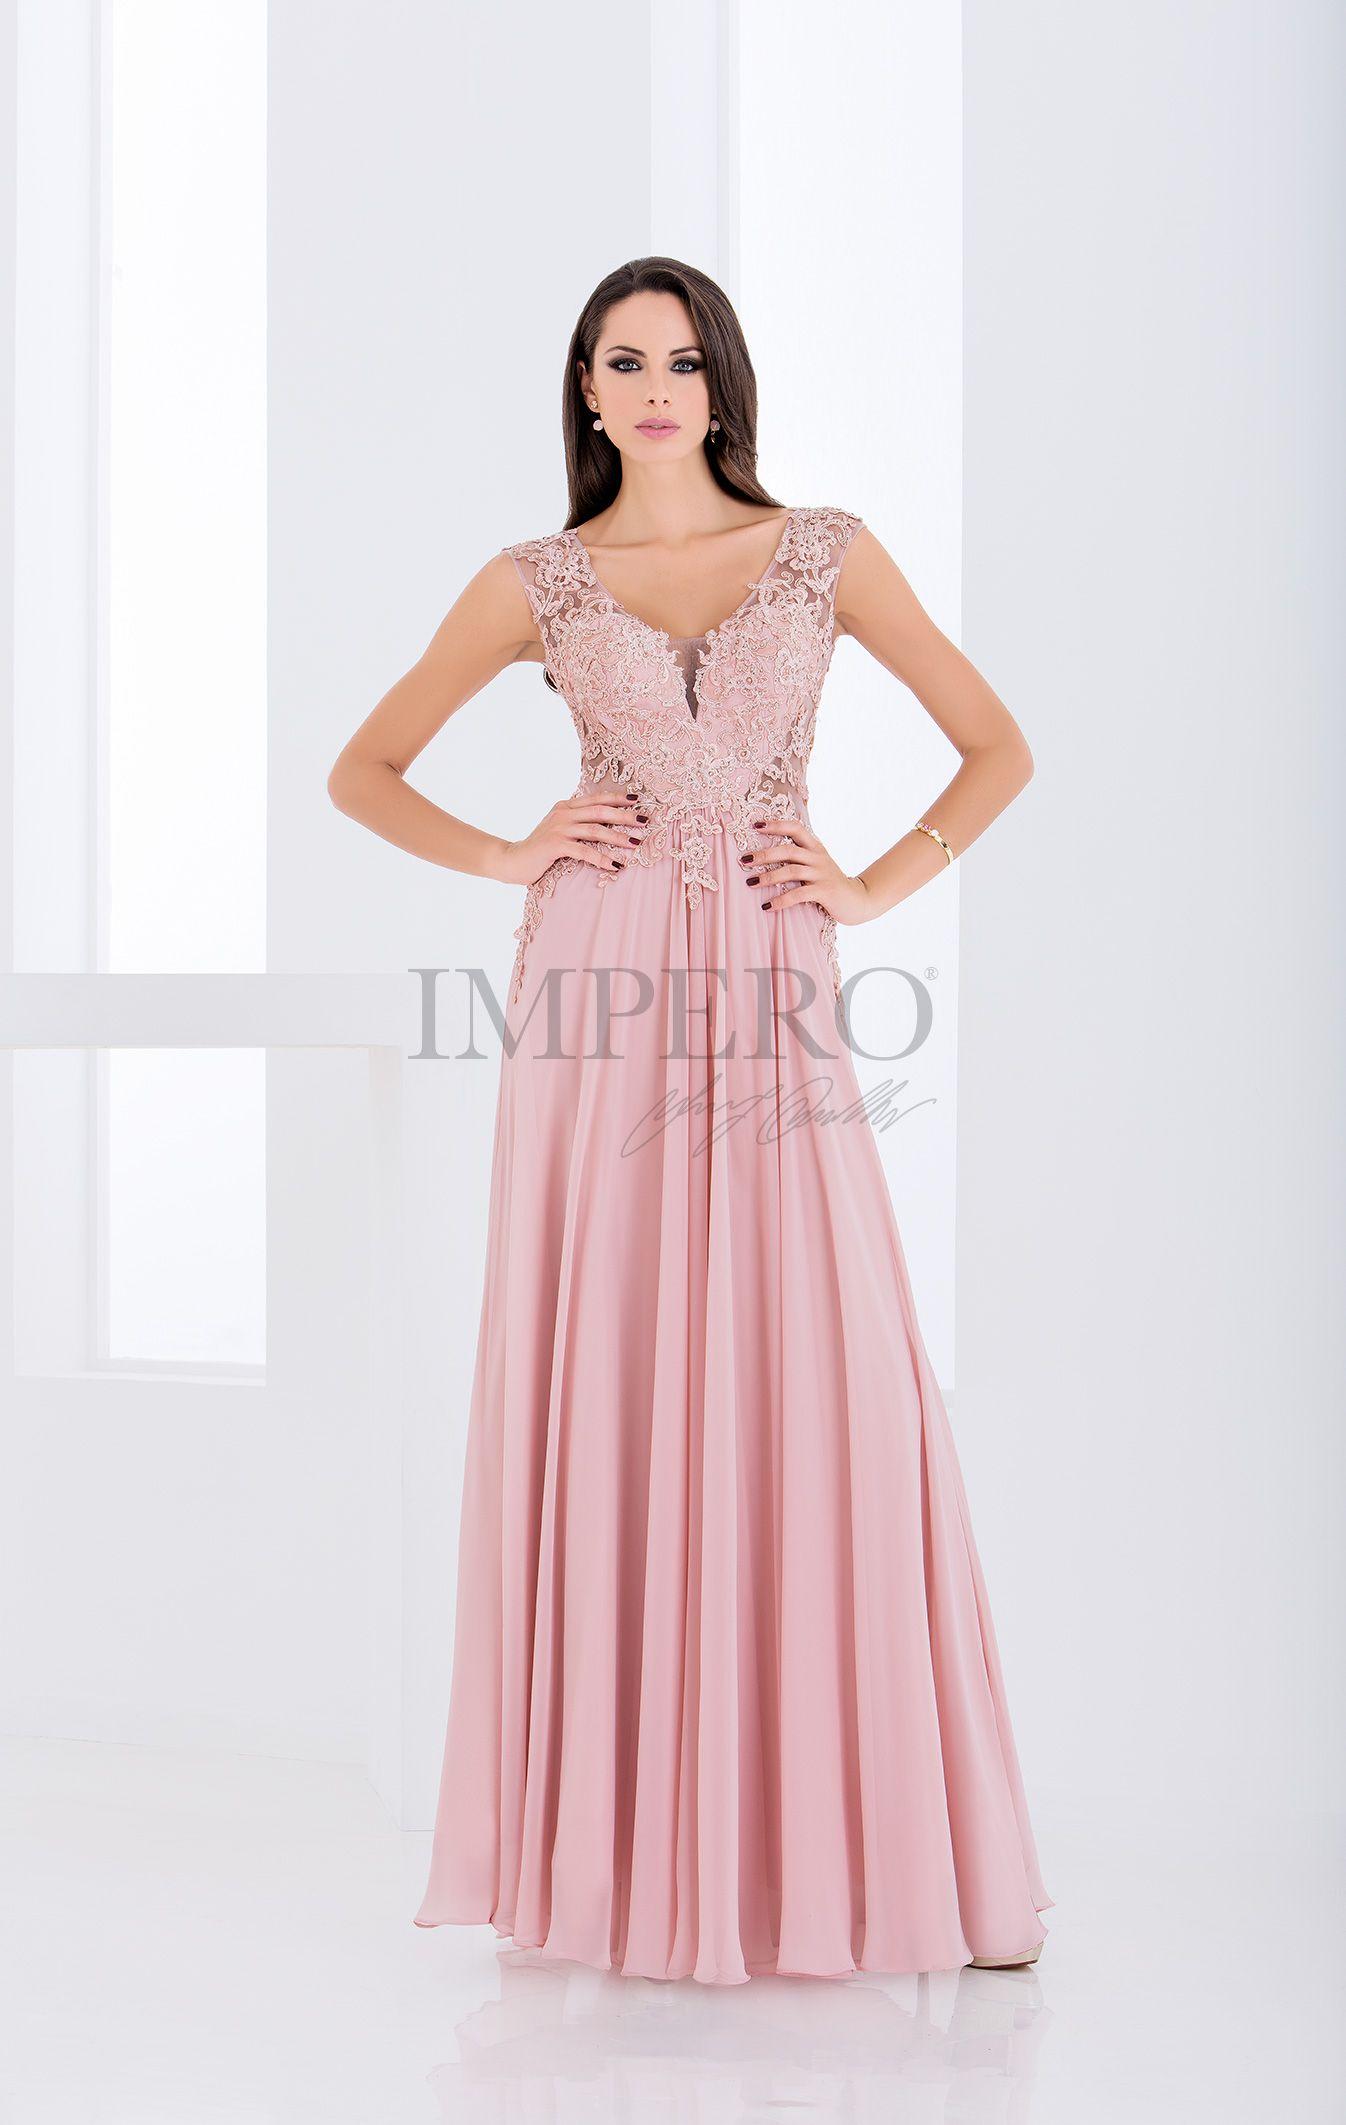 J 137-16 #abiti #dress #wedding #matrimonio #cerimonia #party #event ...